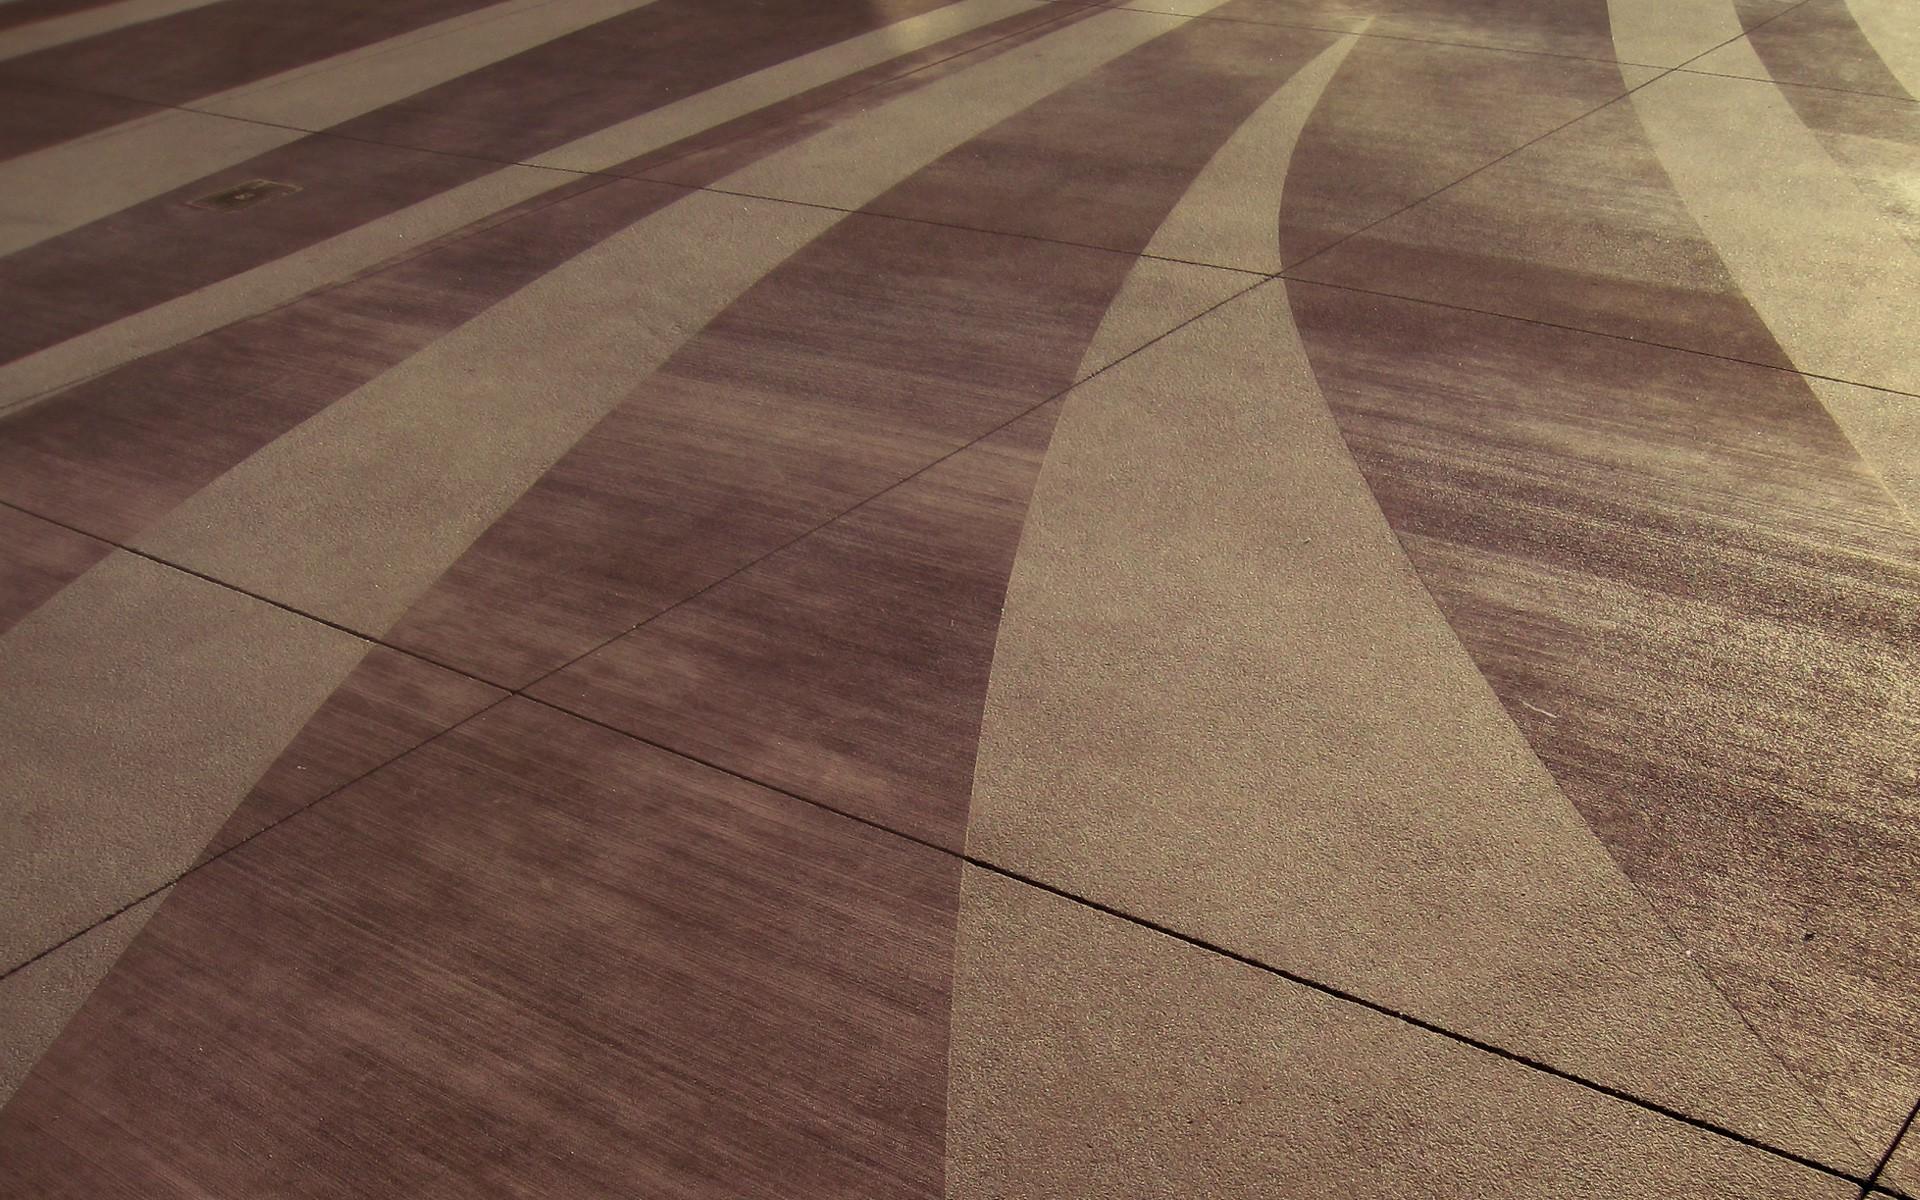 Holz Muster Fliesen Fliese Gestalten Stock Linie Hartholz 1920x1200 Px  Bodenbelag Holzboden Holzbeize Laminatboden Straßenbelag